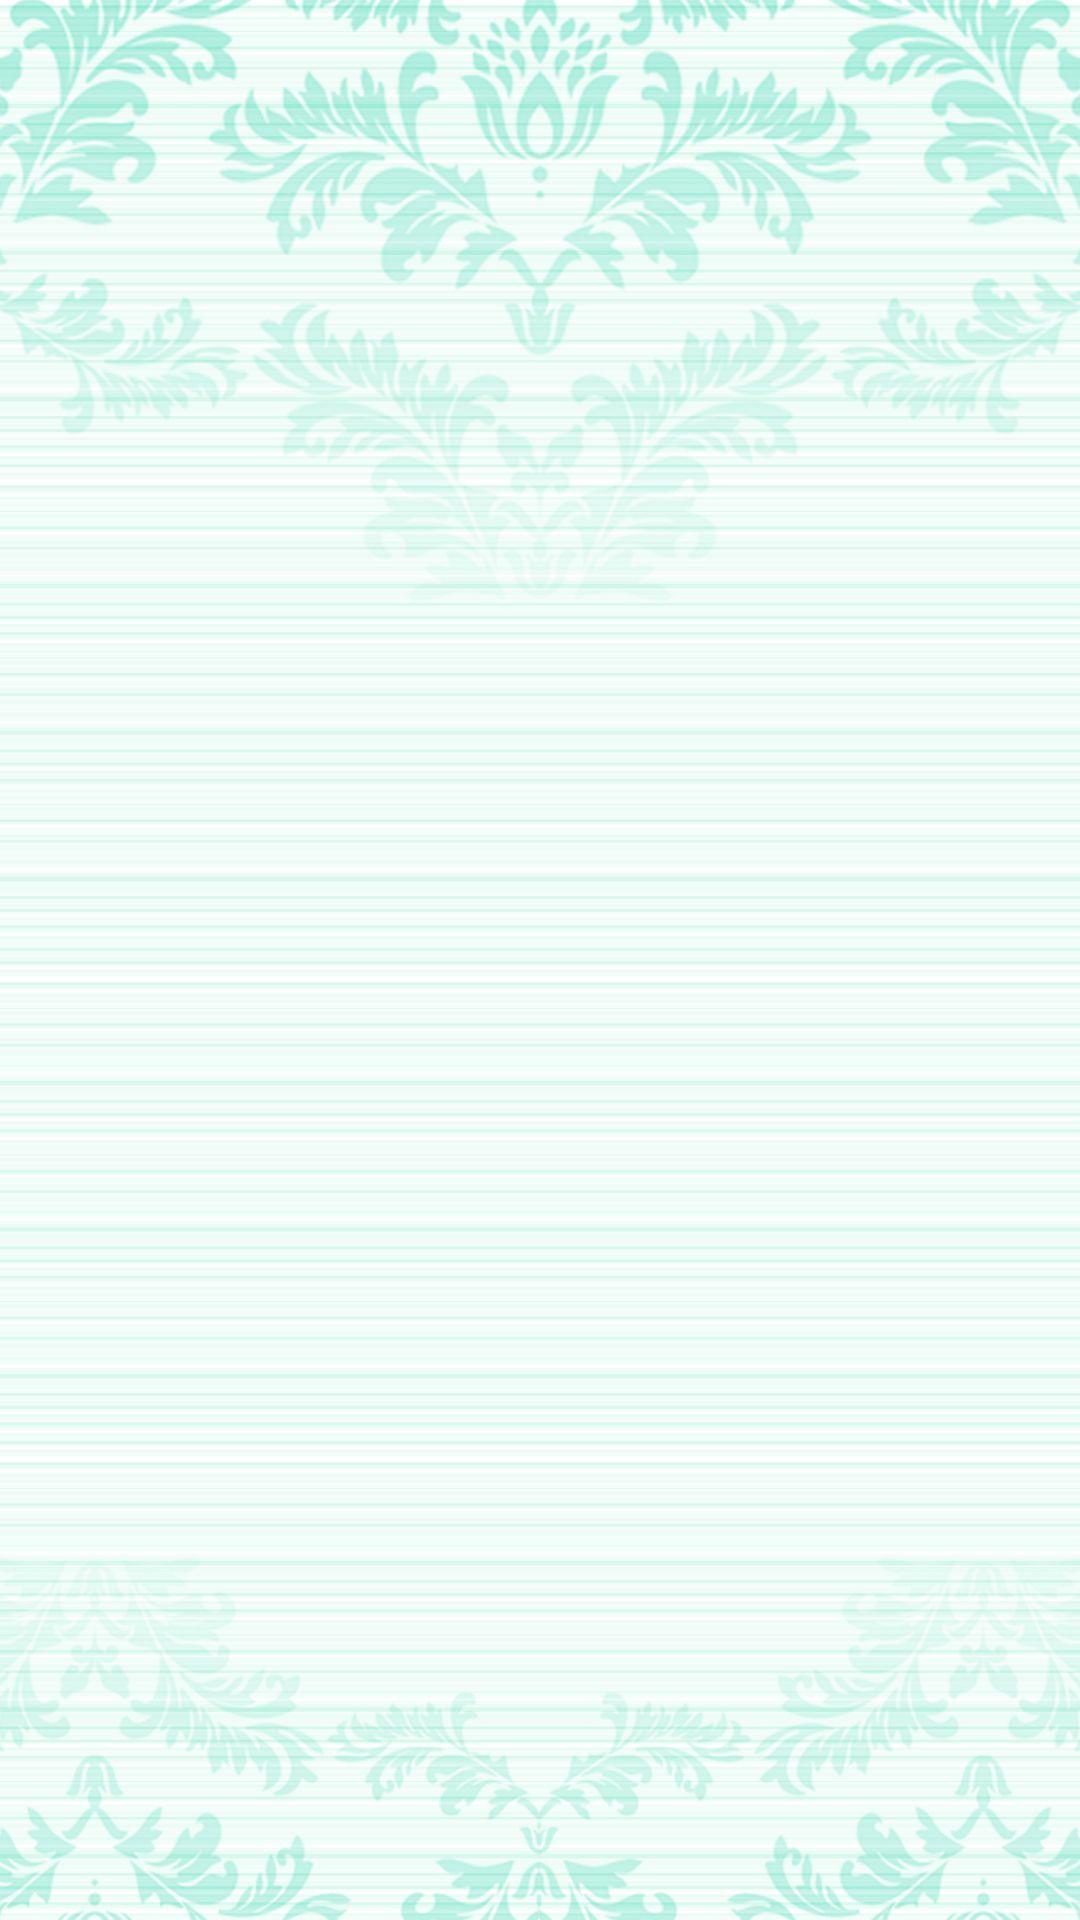 Elegant Green And Gold Wallpaper Home Screen In 2020 Mint Green Wallpaper Green Wallpaper Phone Wallpaper